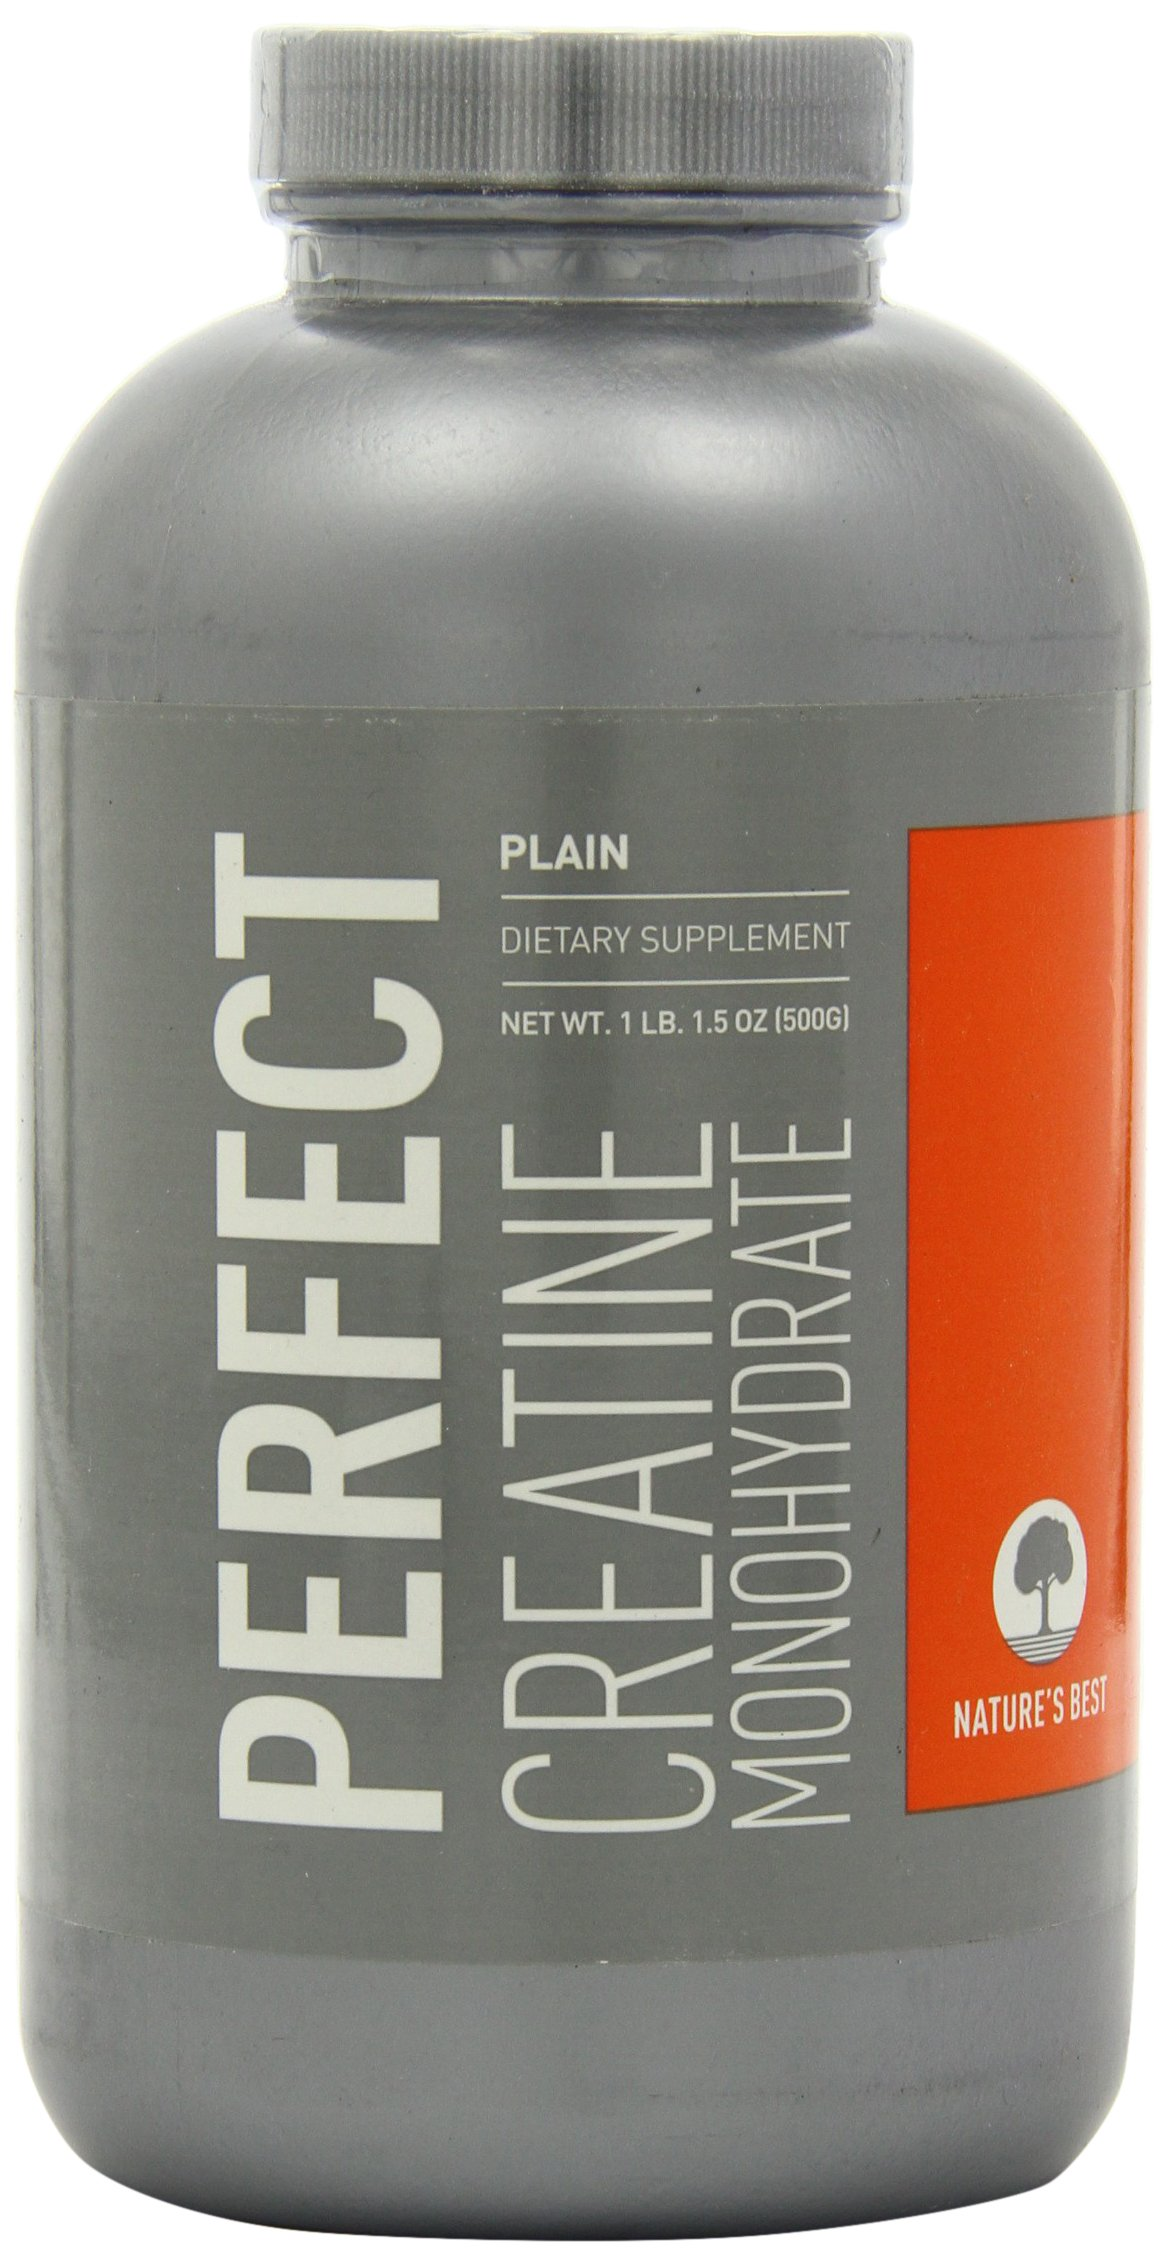 Natures Best Perfect Creatine Monohydrate Powder, 1LB. 17.5 OZ(500G)